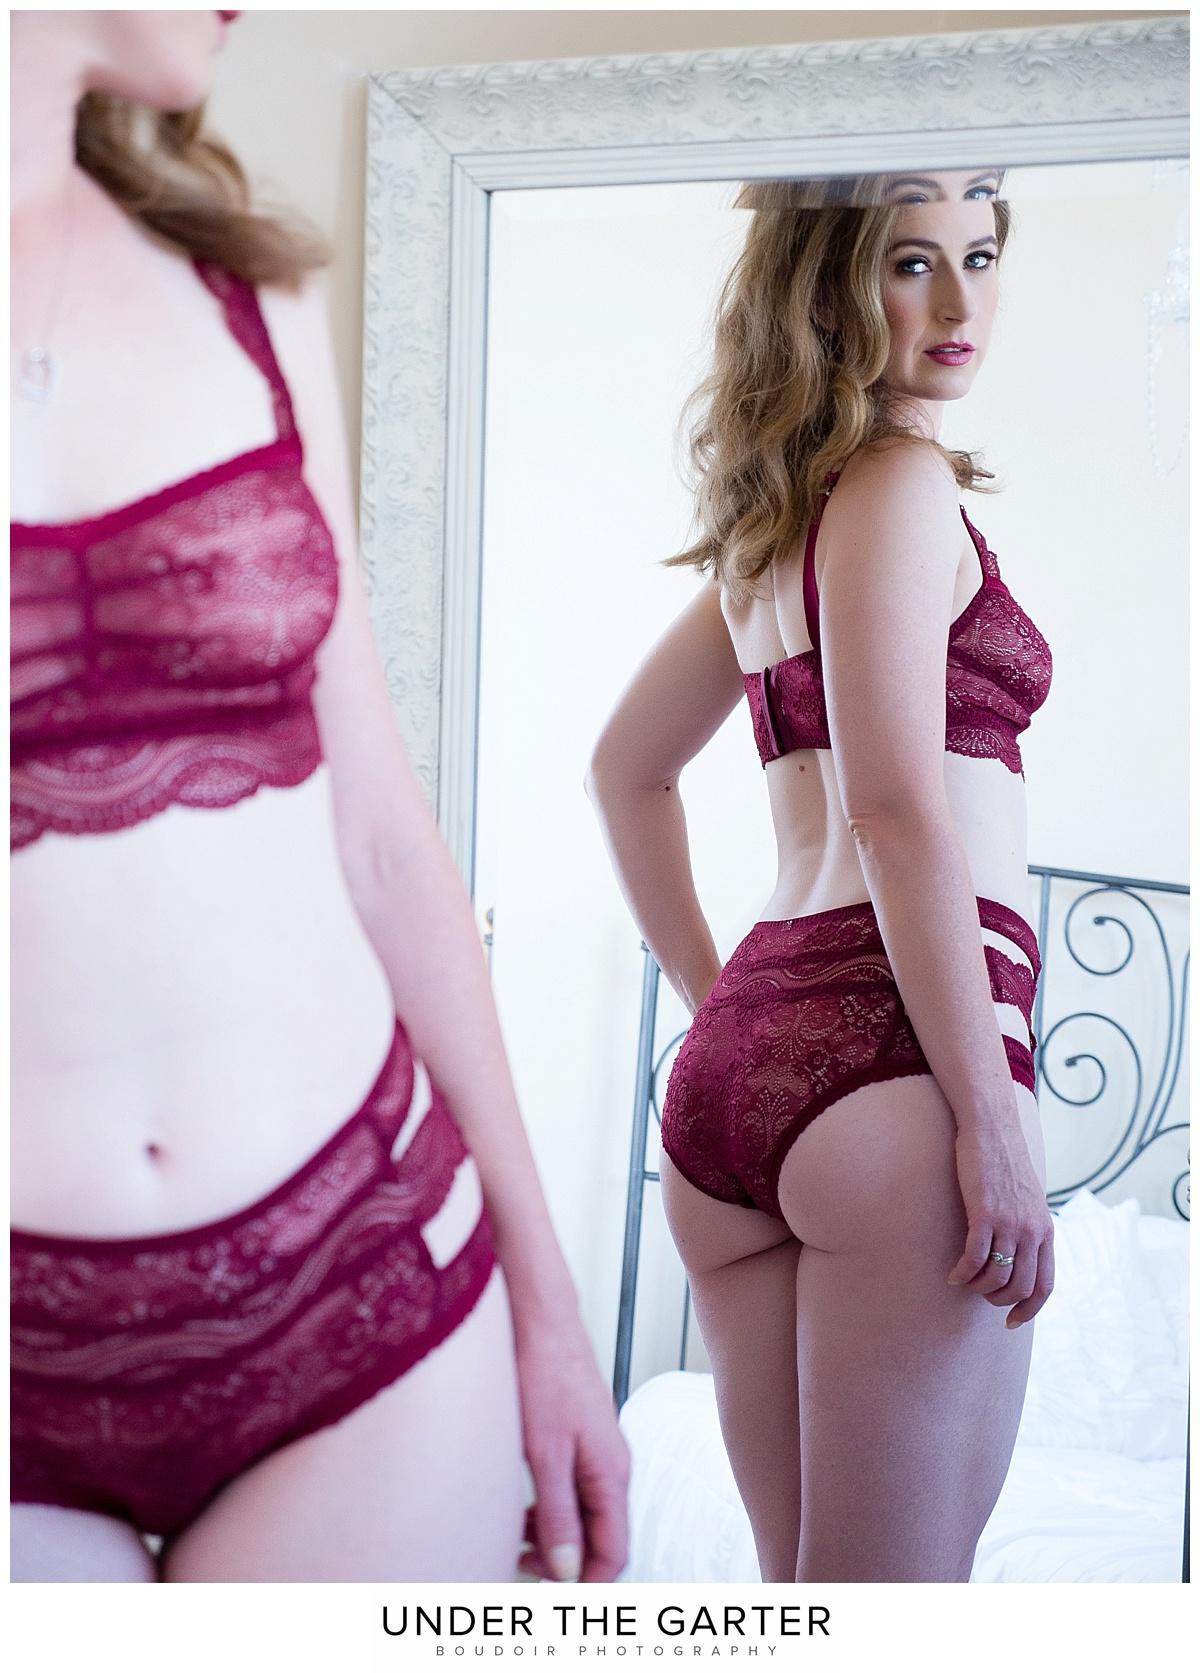 boudoir photography denver tushie tuesday lace lingerie.jpg